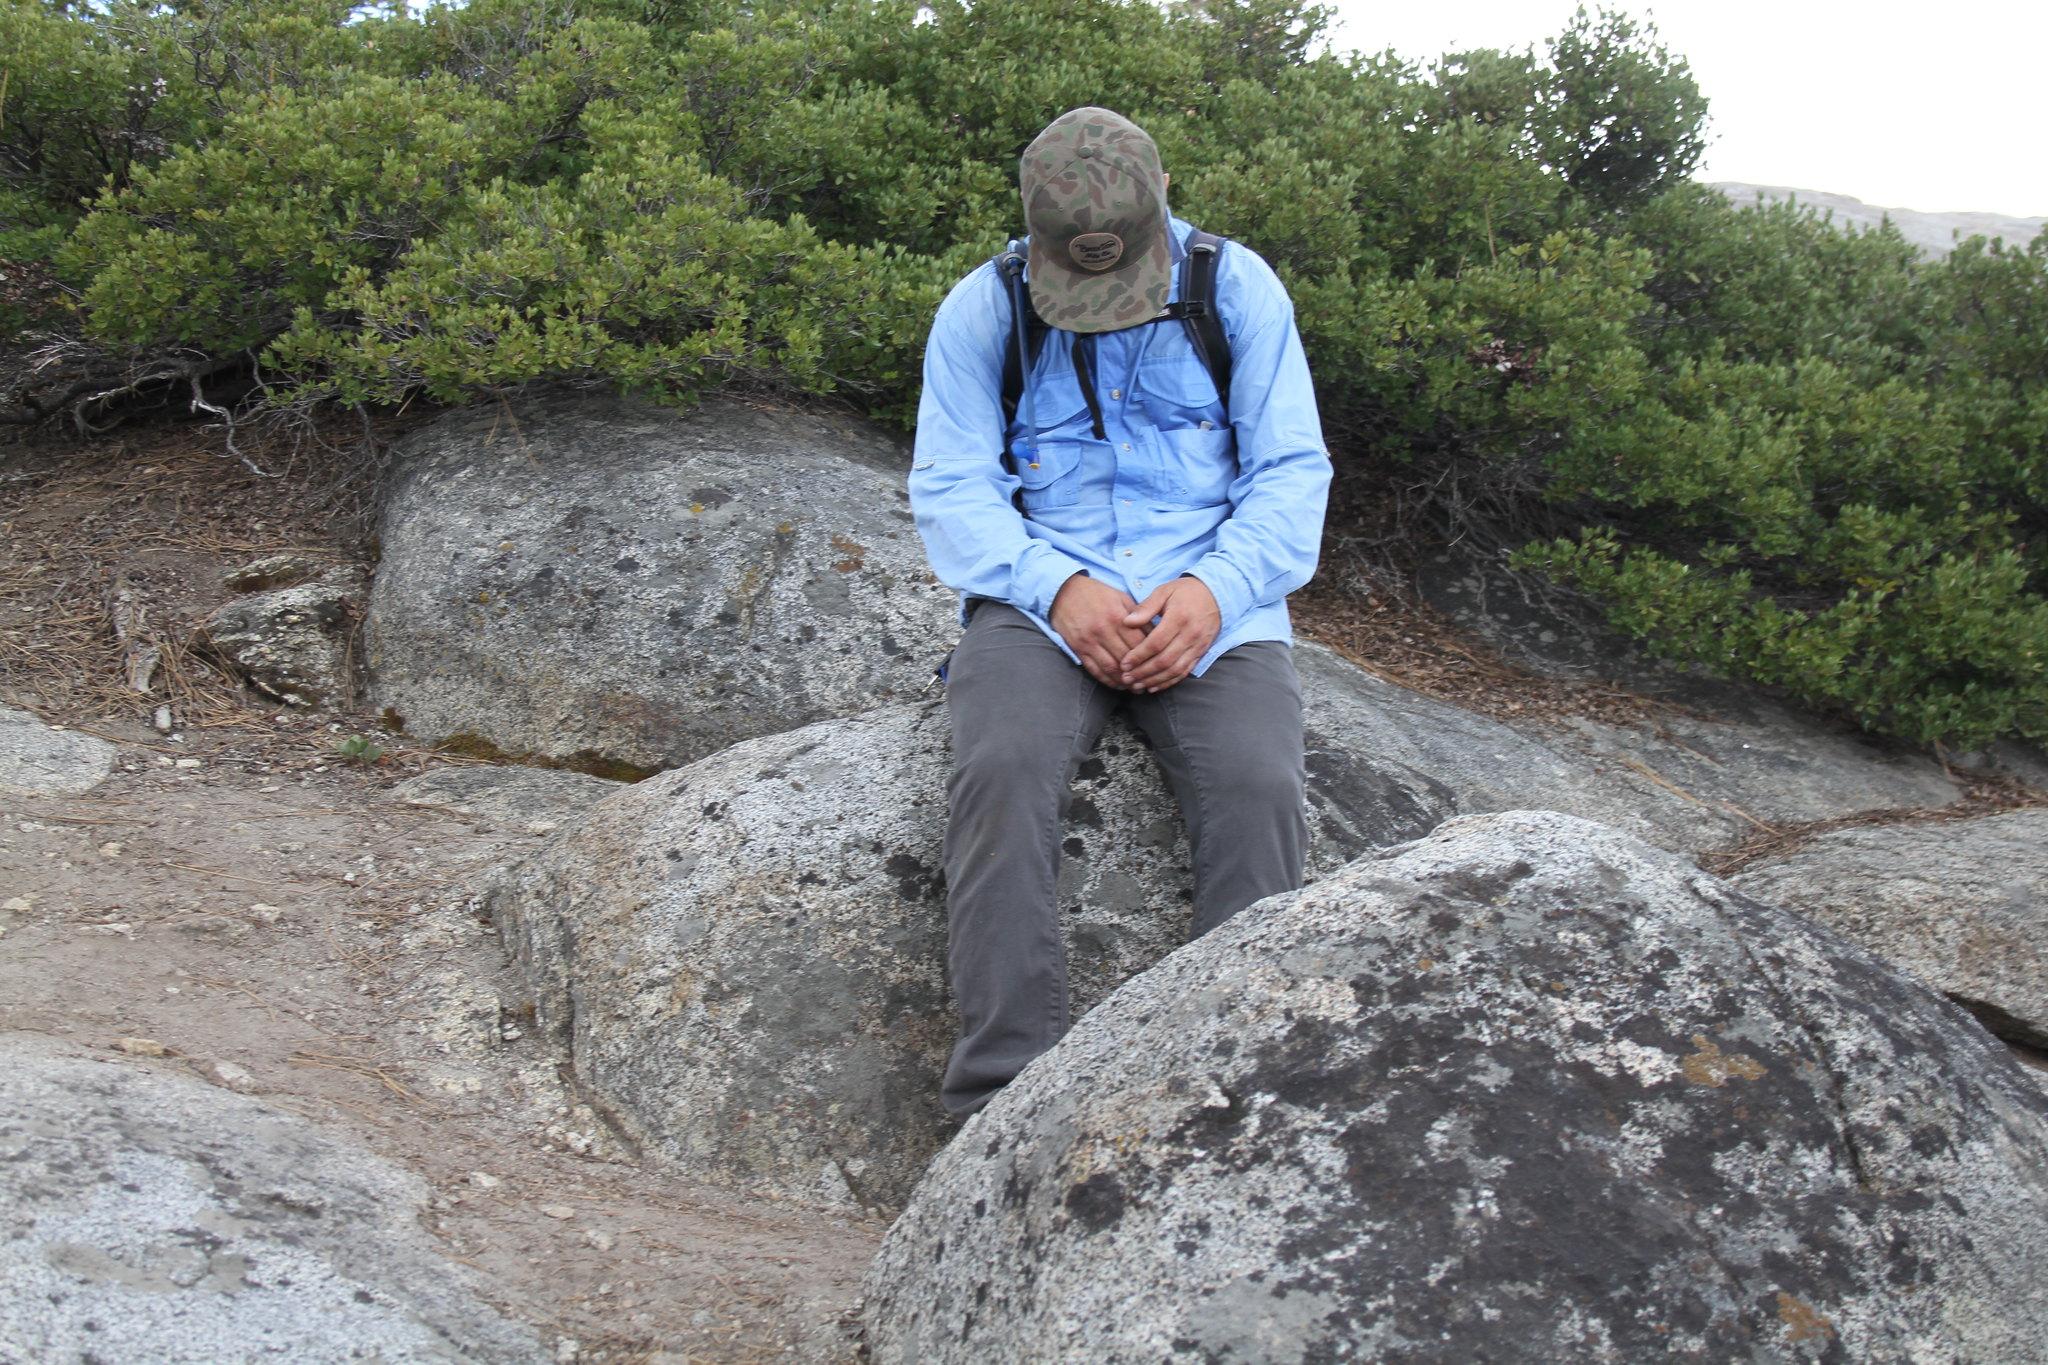 Four Mile Hike - Yosemite National Park